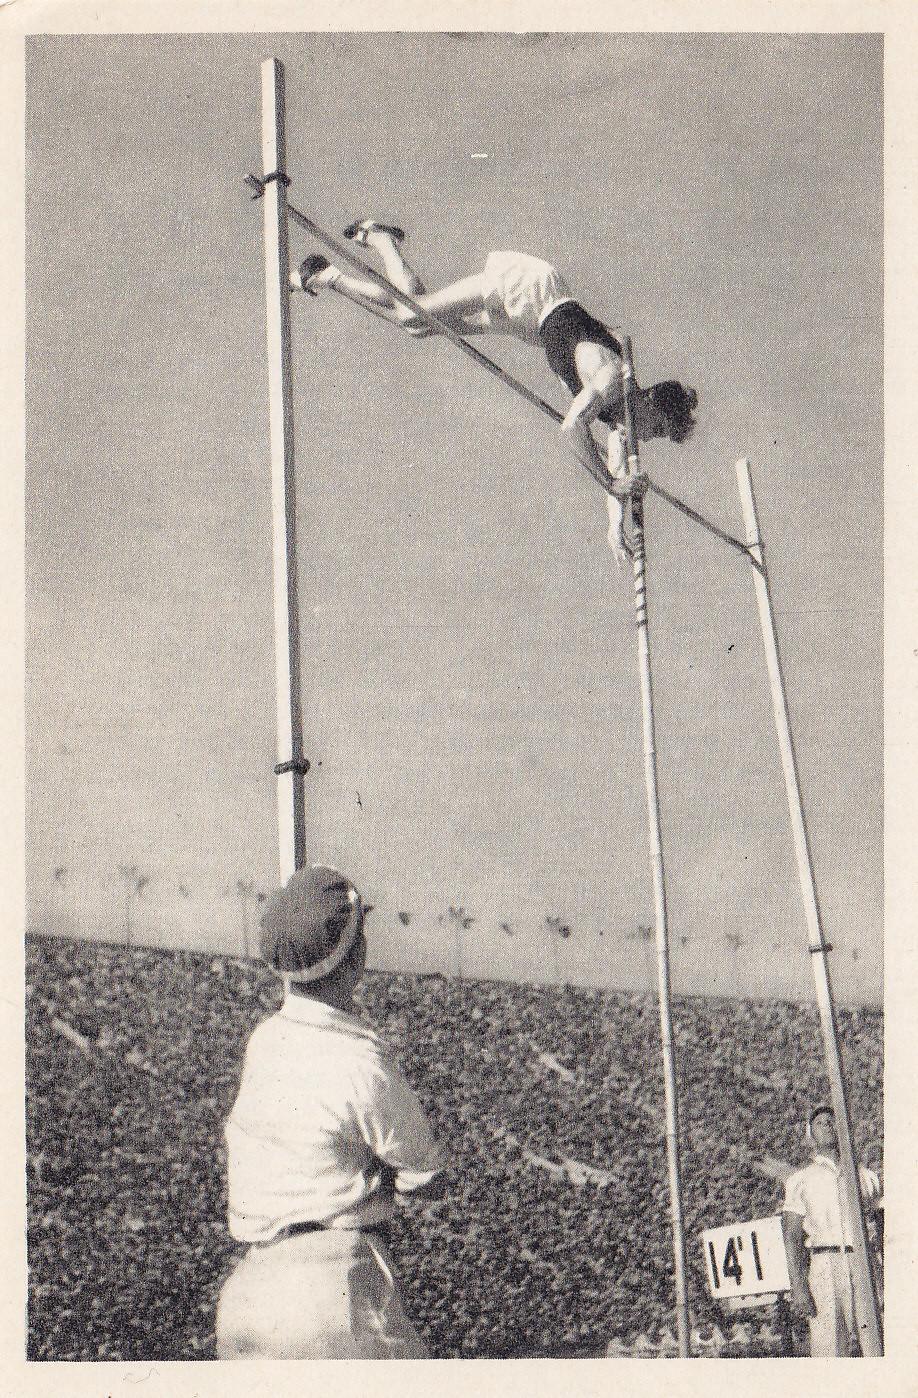 Olympia 1932 / Bild 46